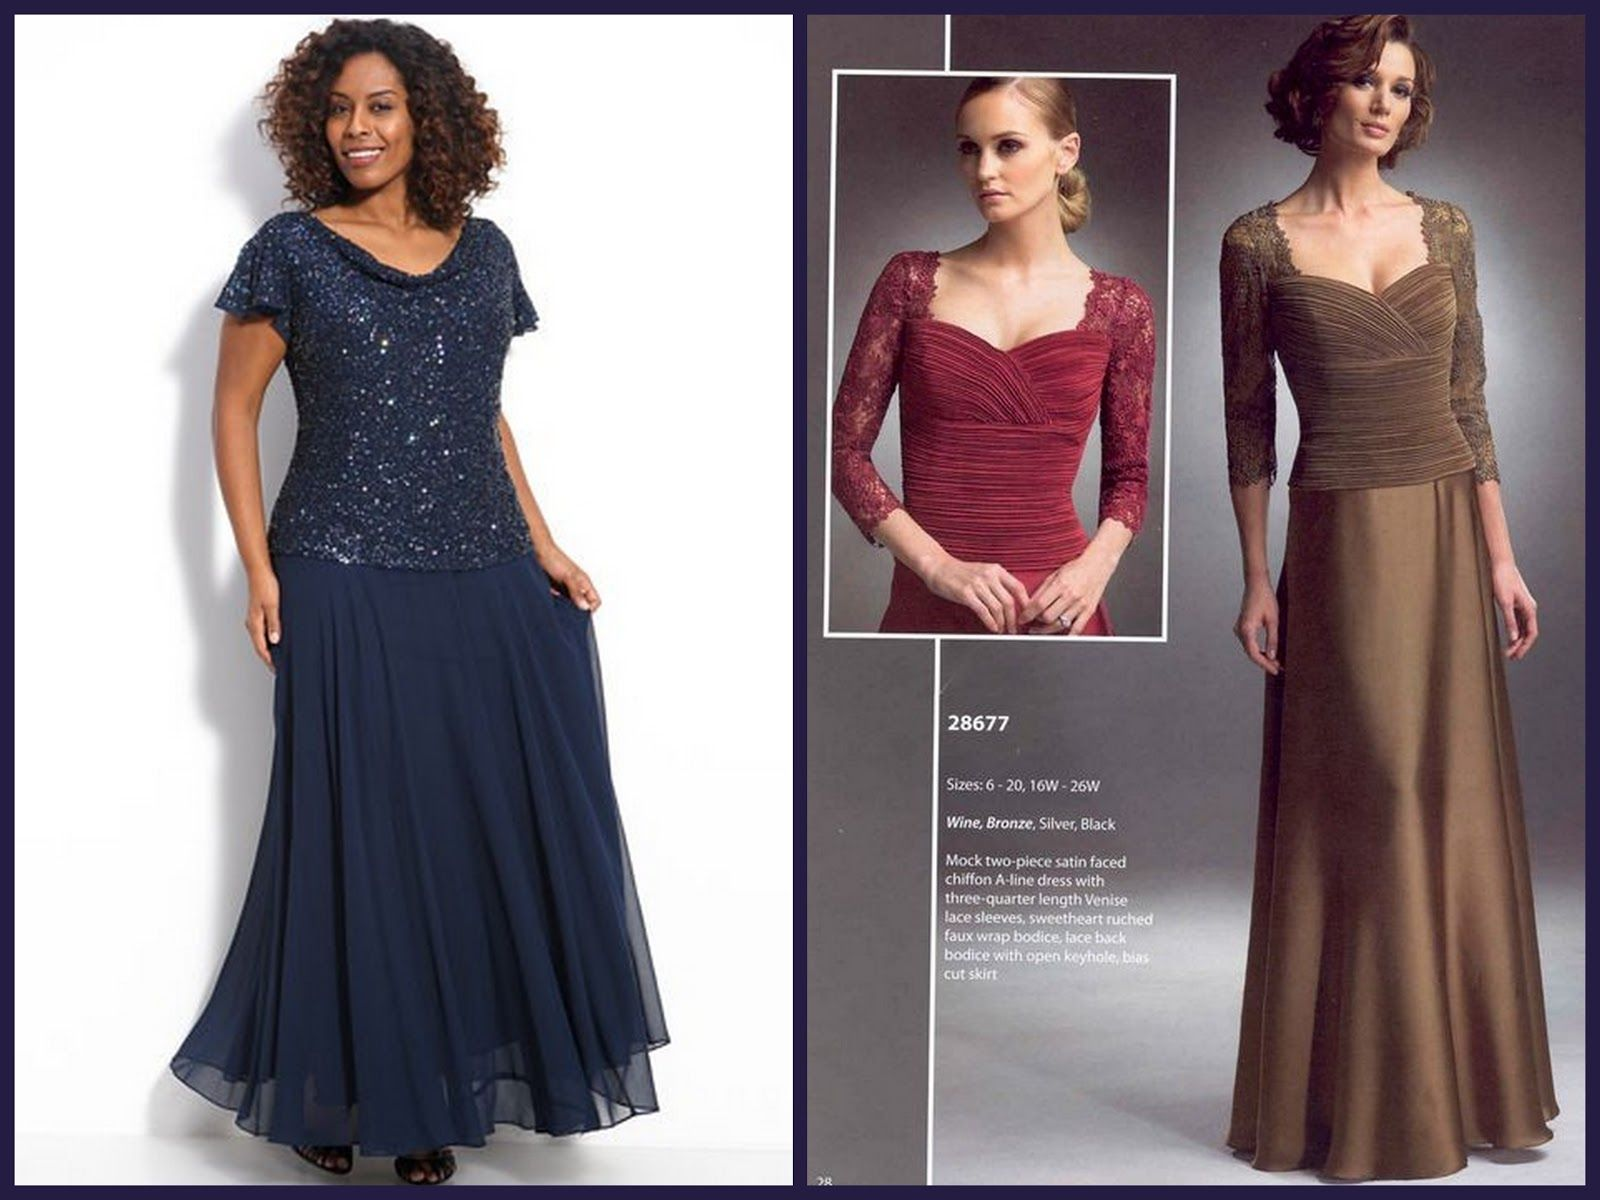 Mother Of The Bride Dresses For Fuller Figure